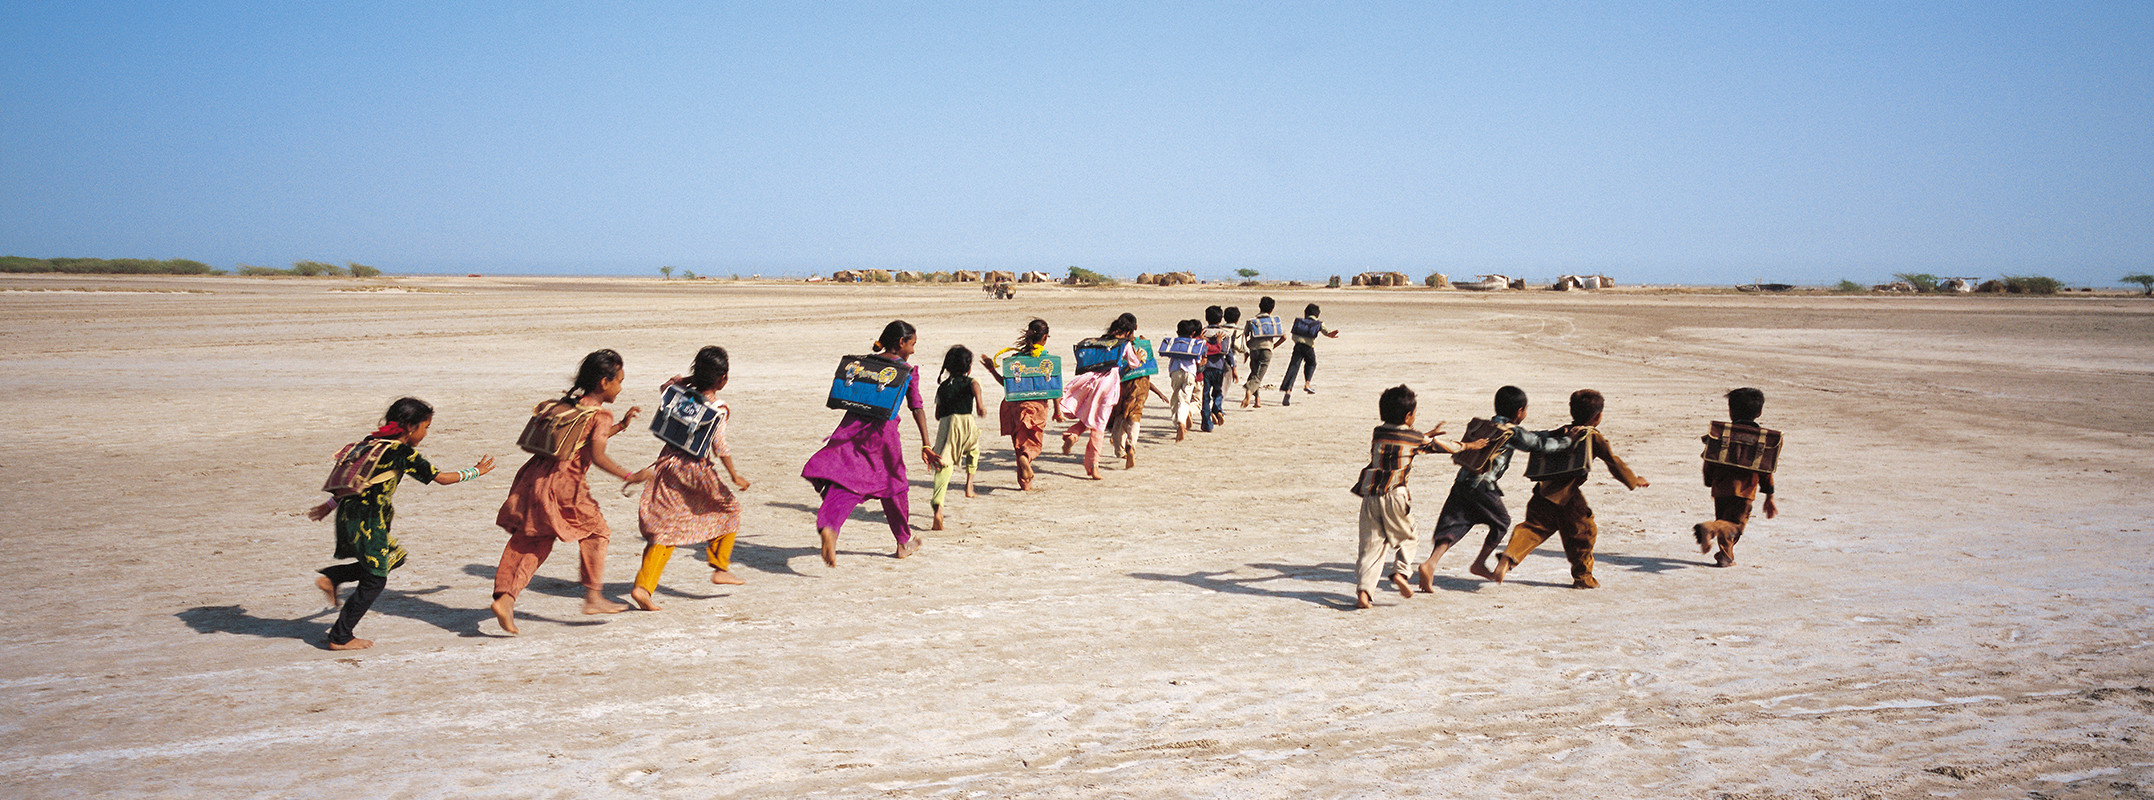 Kutch, Gujarat, 2006: Children return from an AIF supported site school for the migrant Muslim Machhimaar community at Luni Bunder.